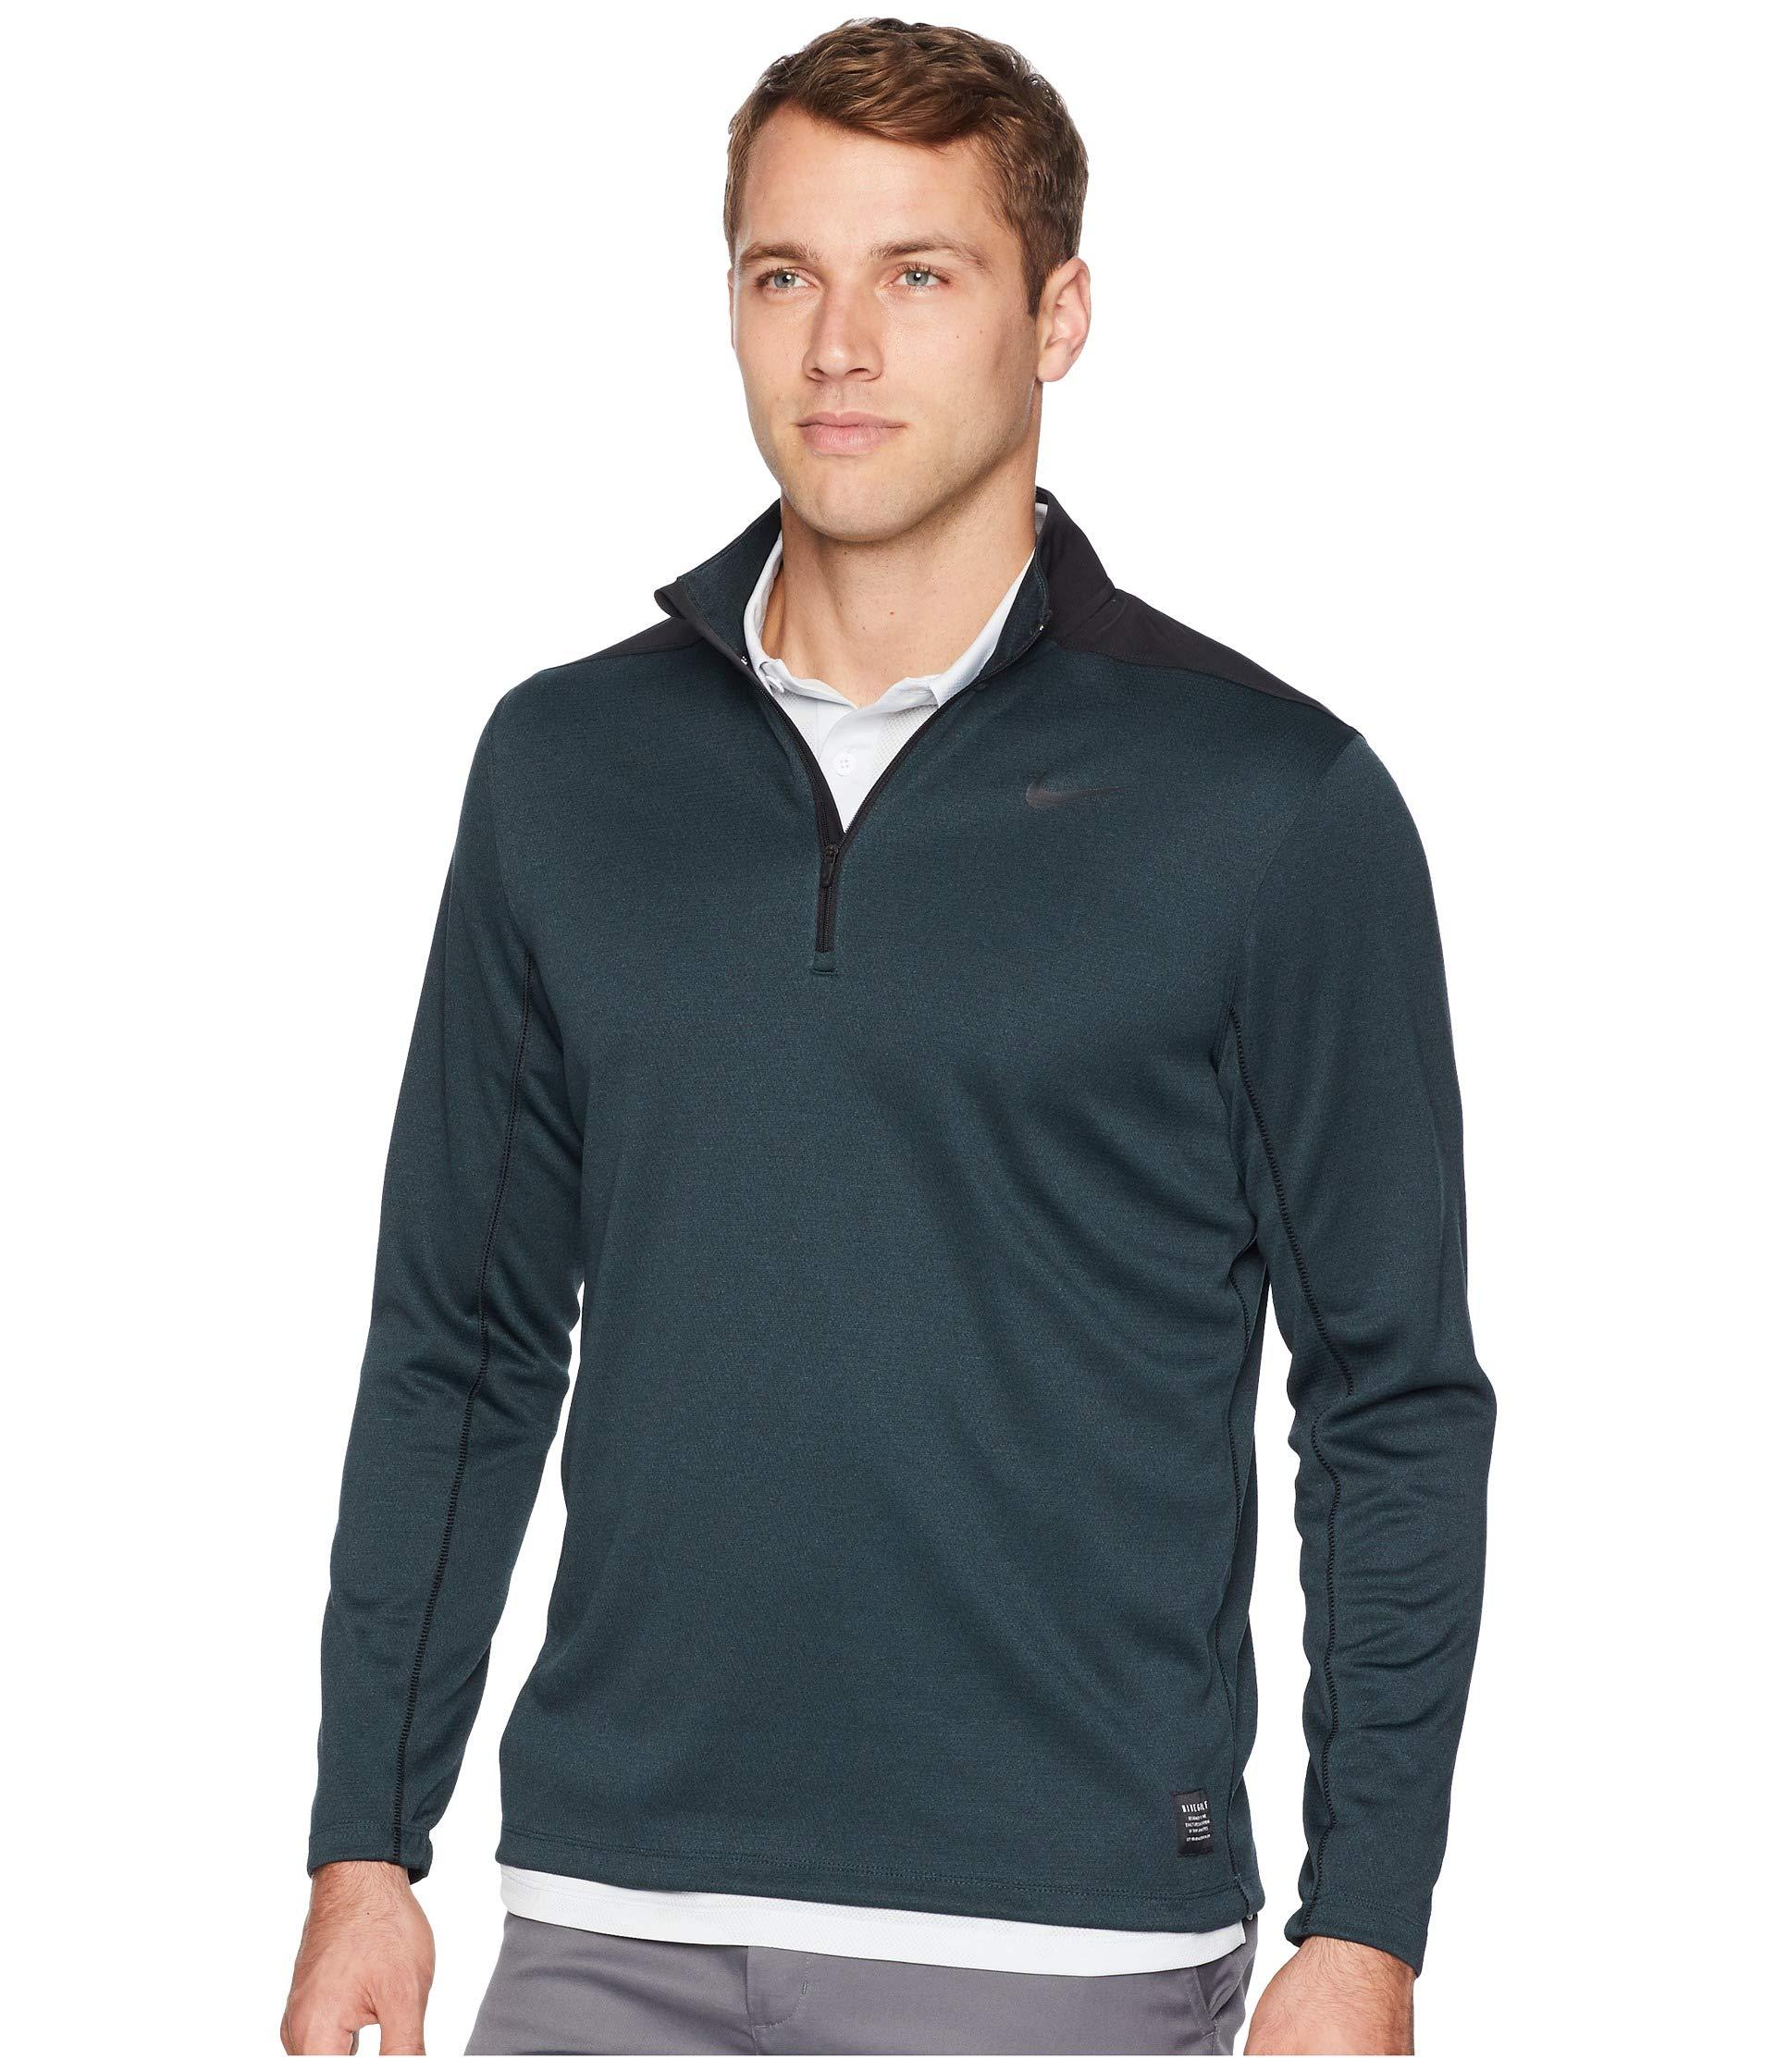 Nike Men's Dry Top Half Zip core Golf Top (Black Midnight Spruce, Small)